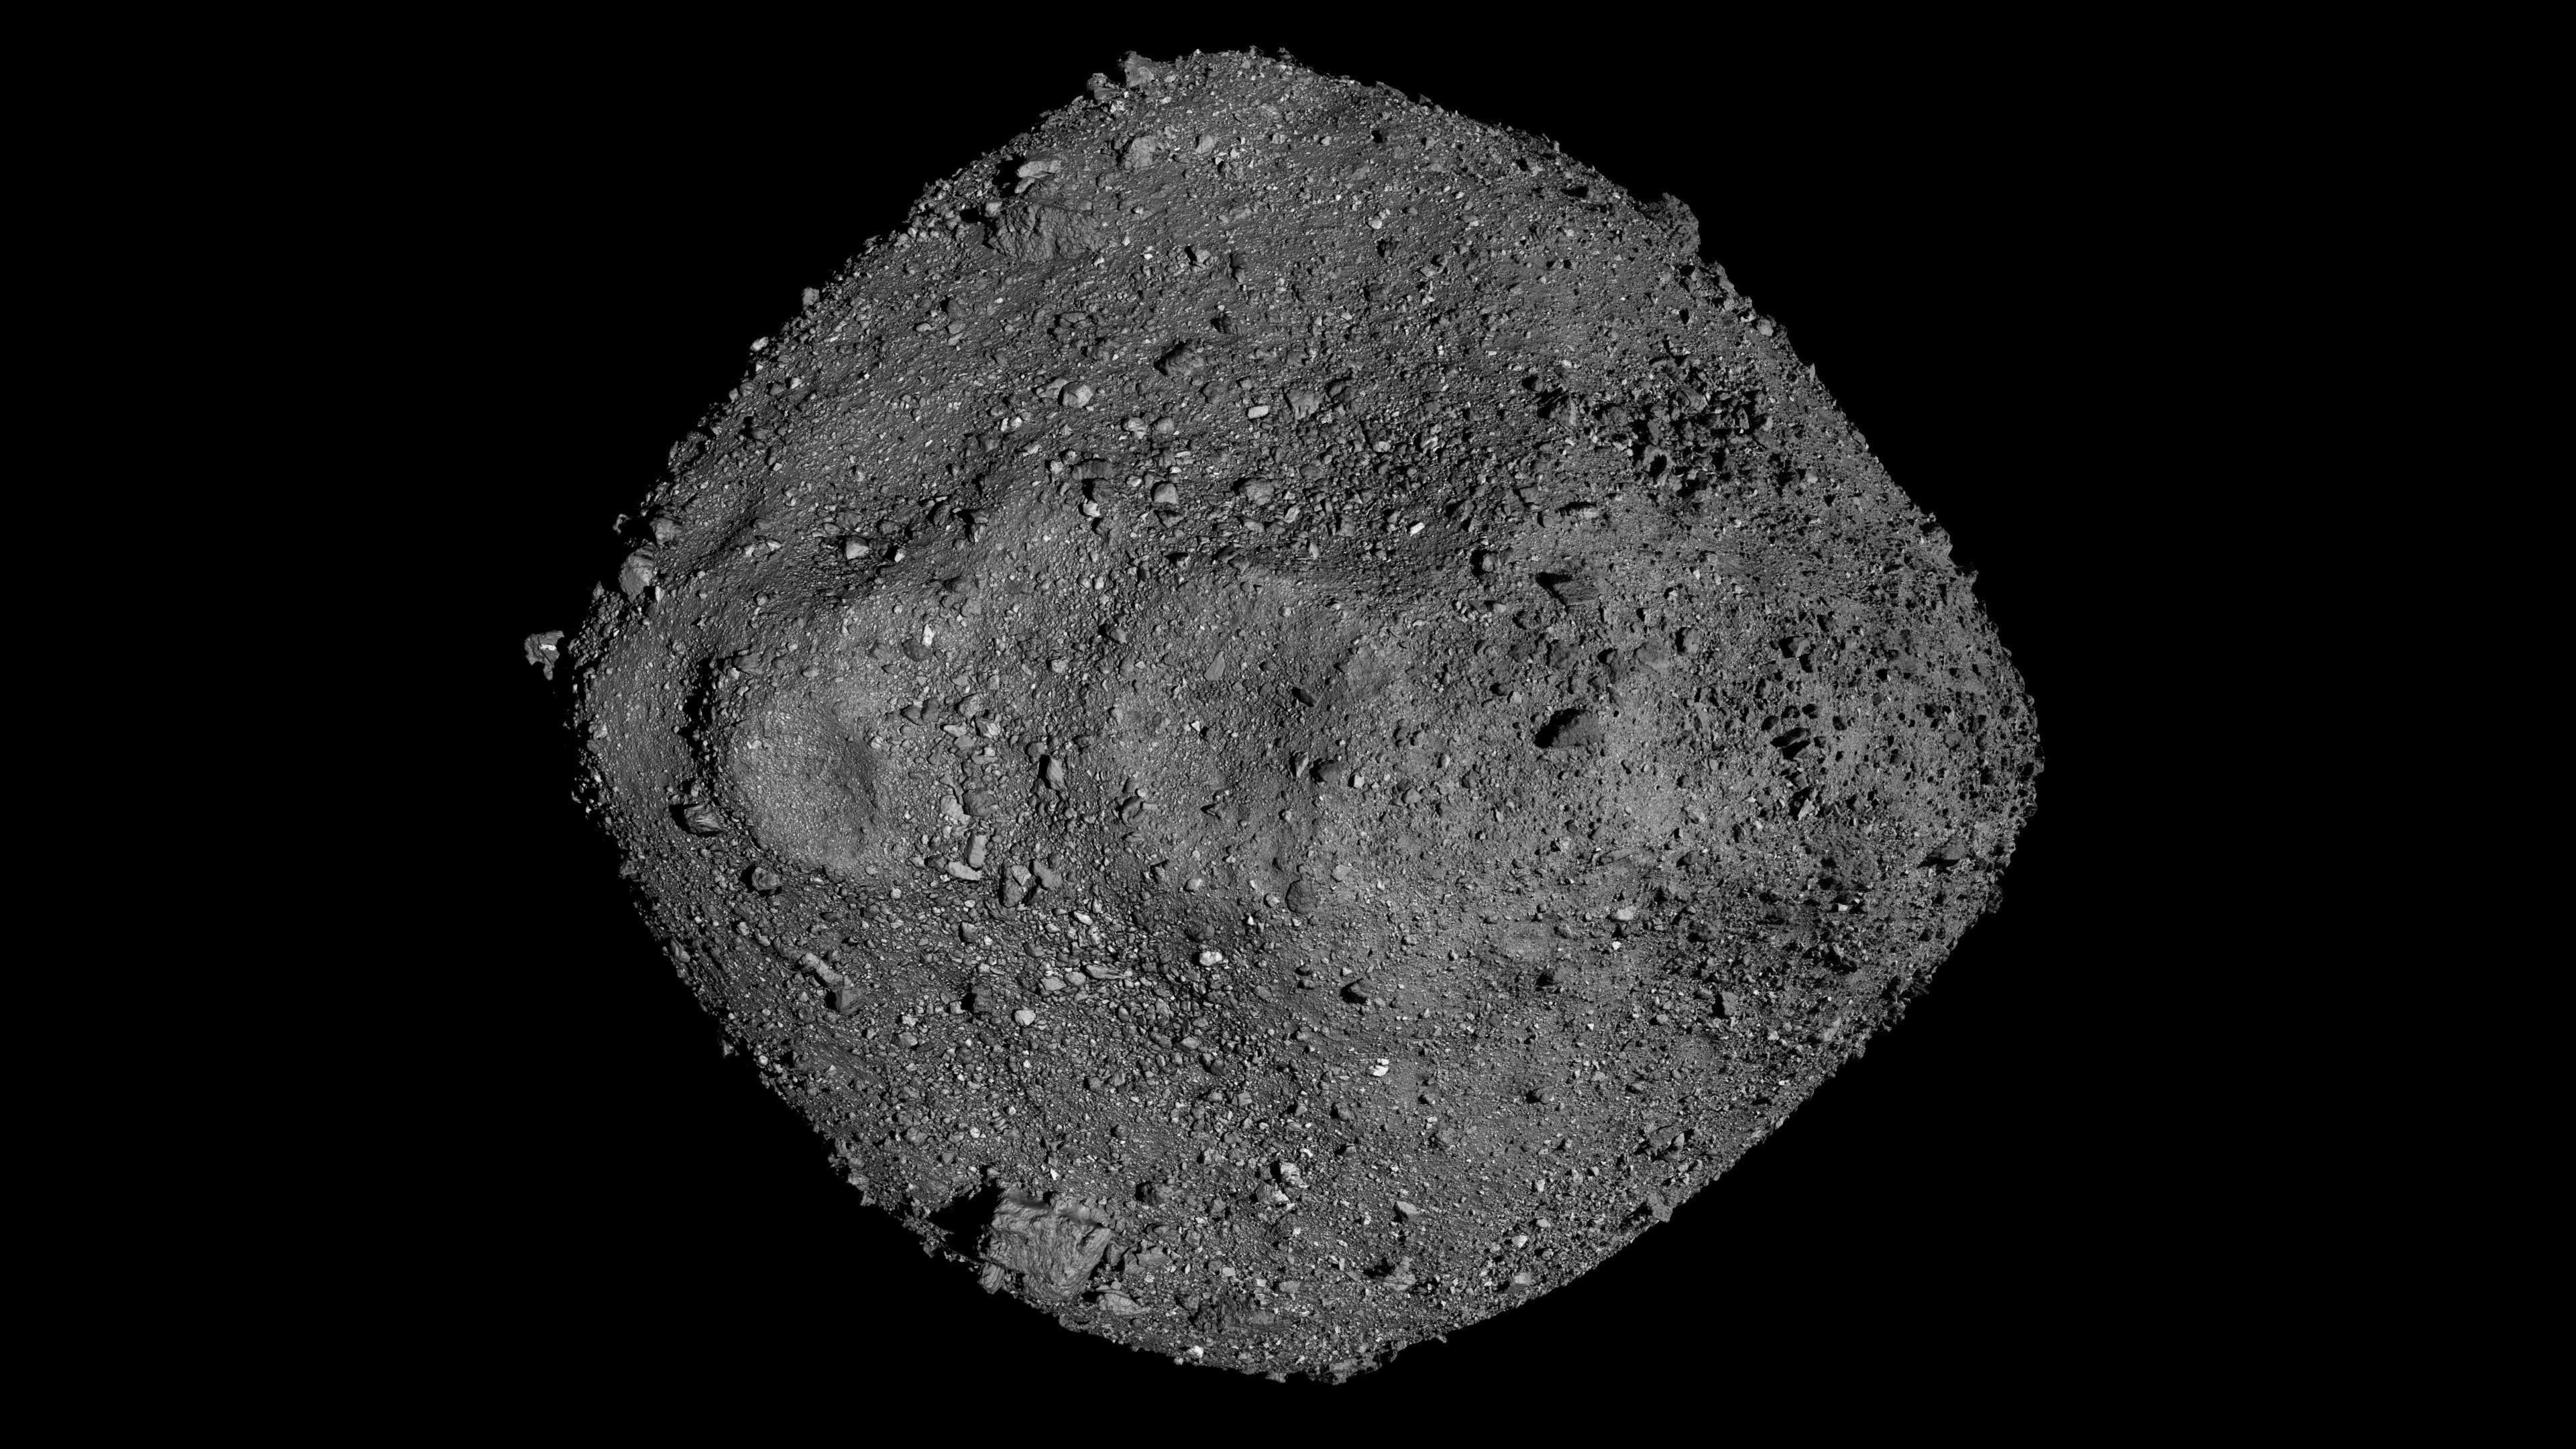 The asteroid Bennu